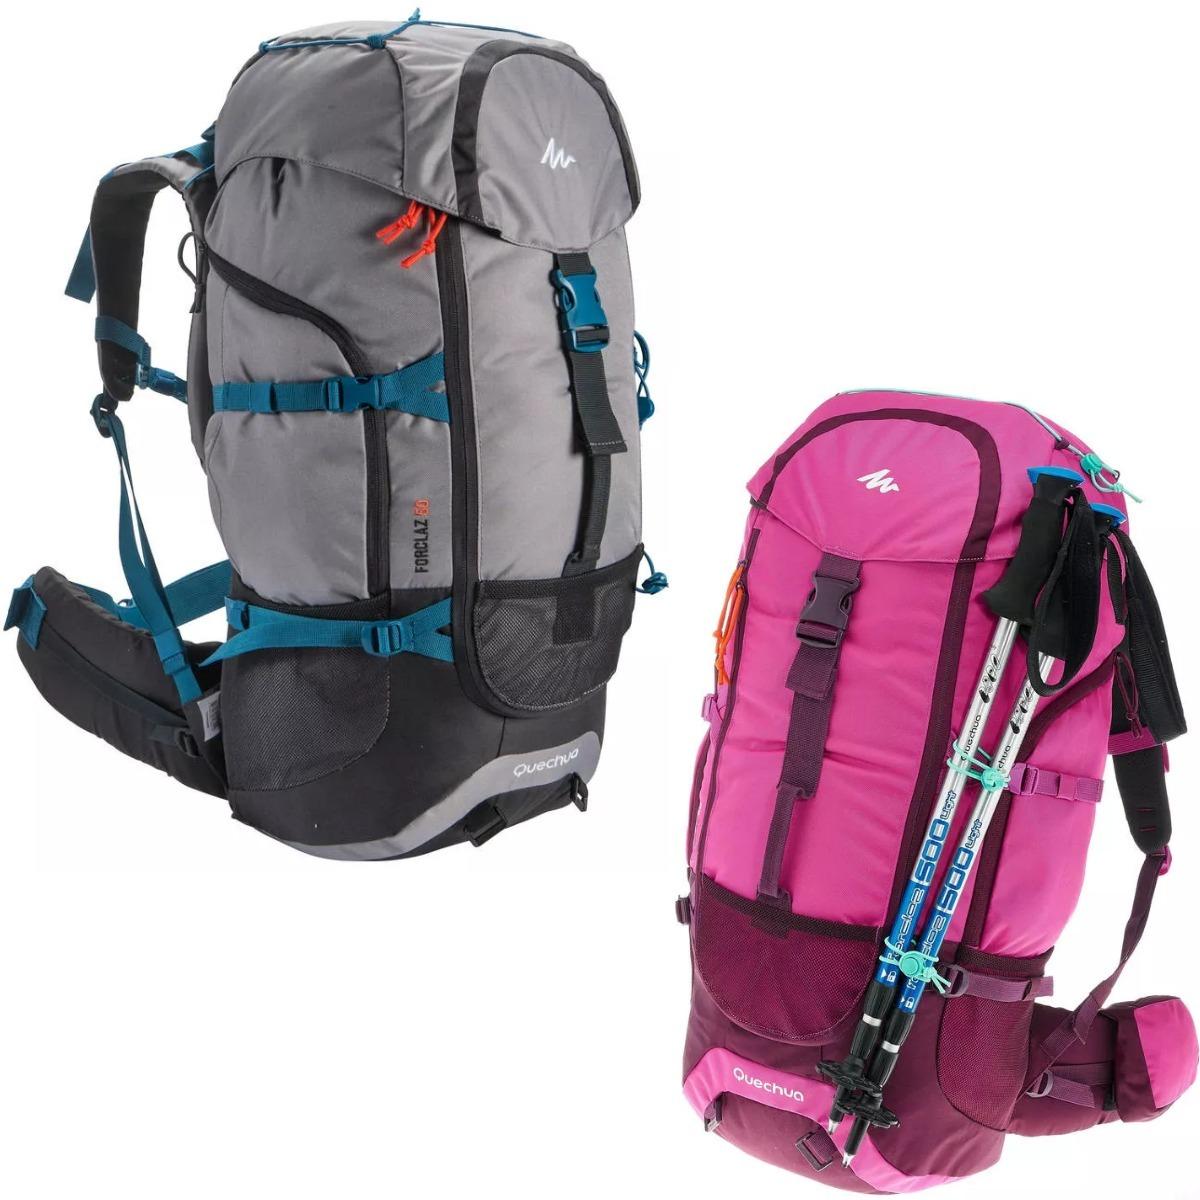 06c89f20b mochila de trekking trilha camping cargueira forclaz 50 l. Carregando zoom.